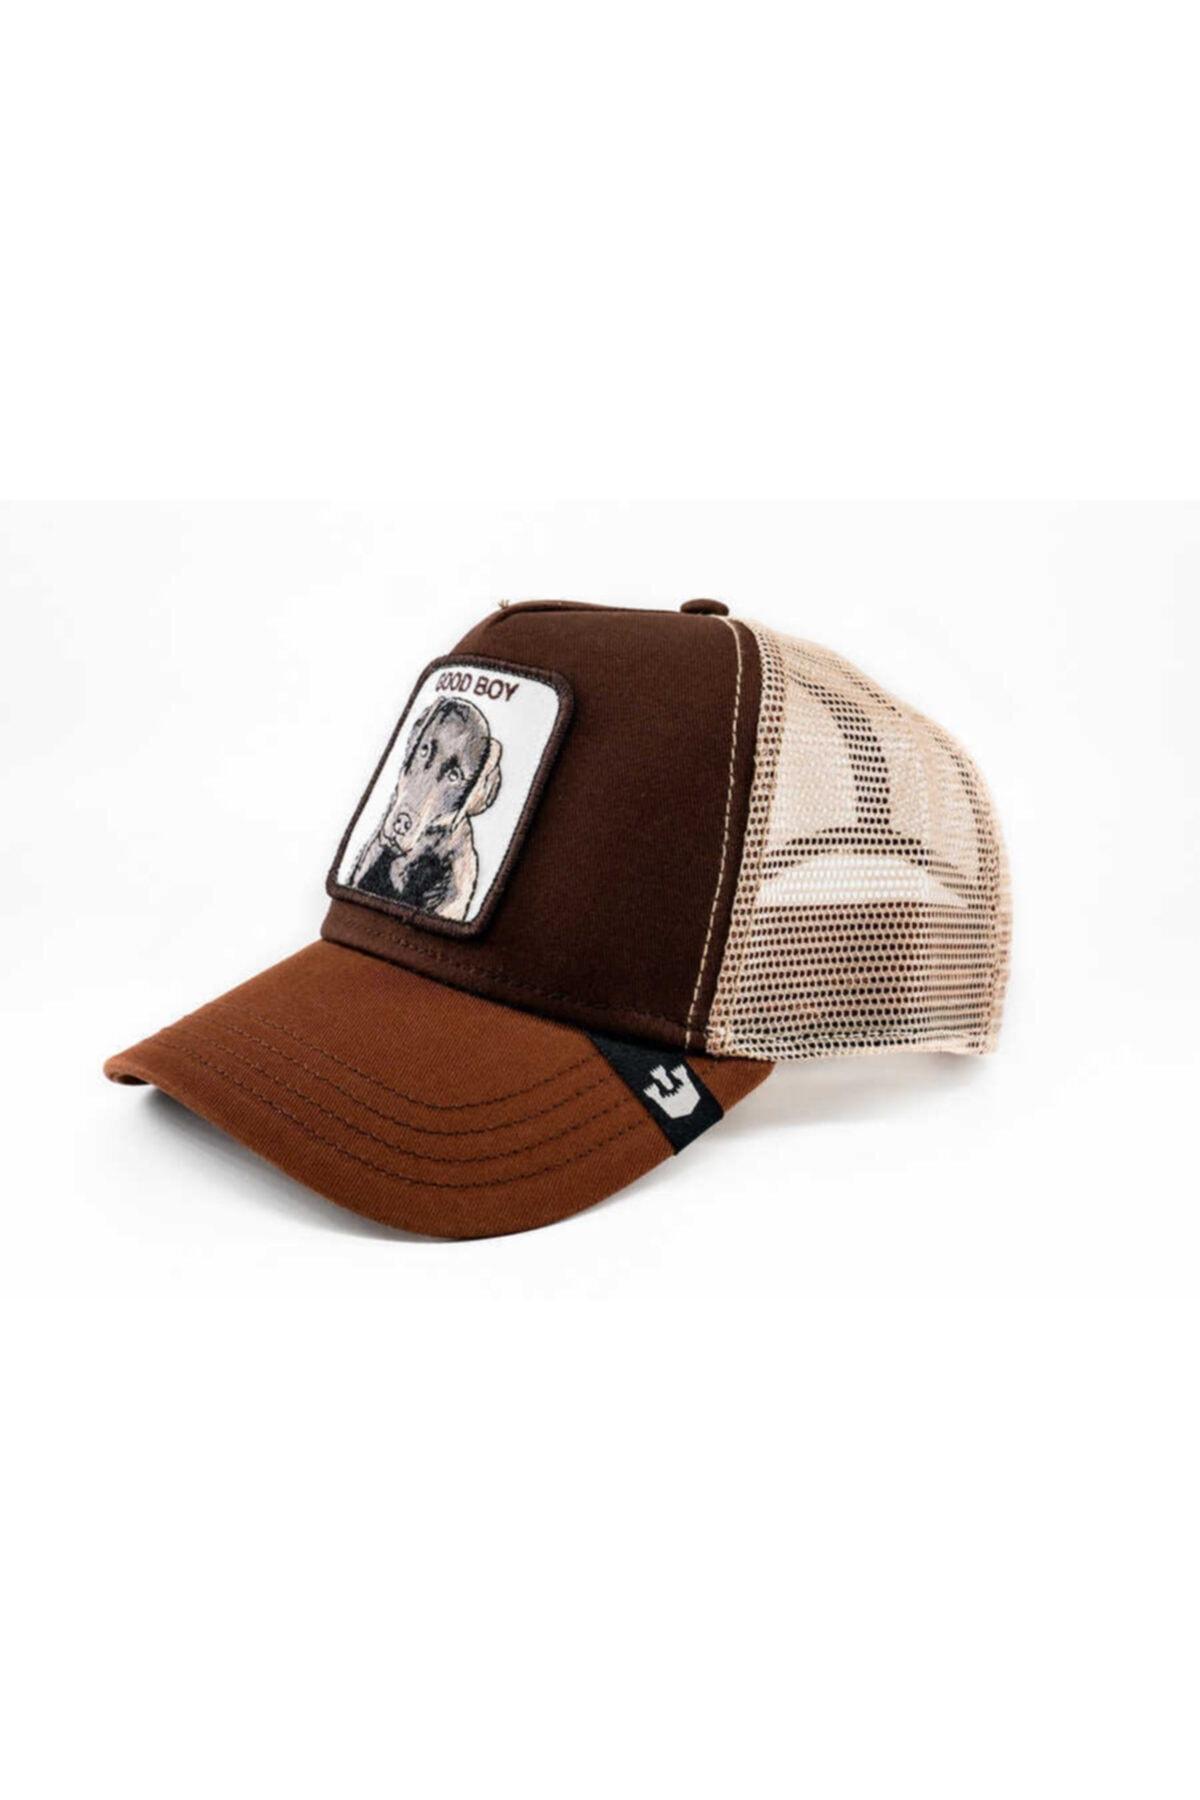 Goorin Bros Unisex Kahverengi Sweet Chocolate Şapka 101-0615 1